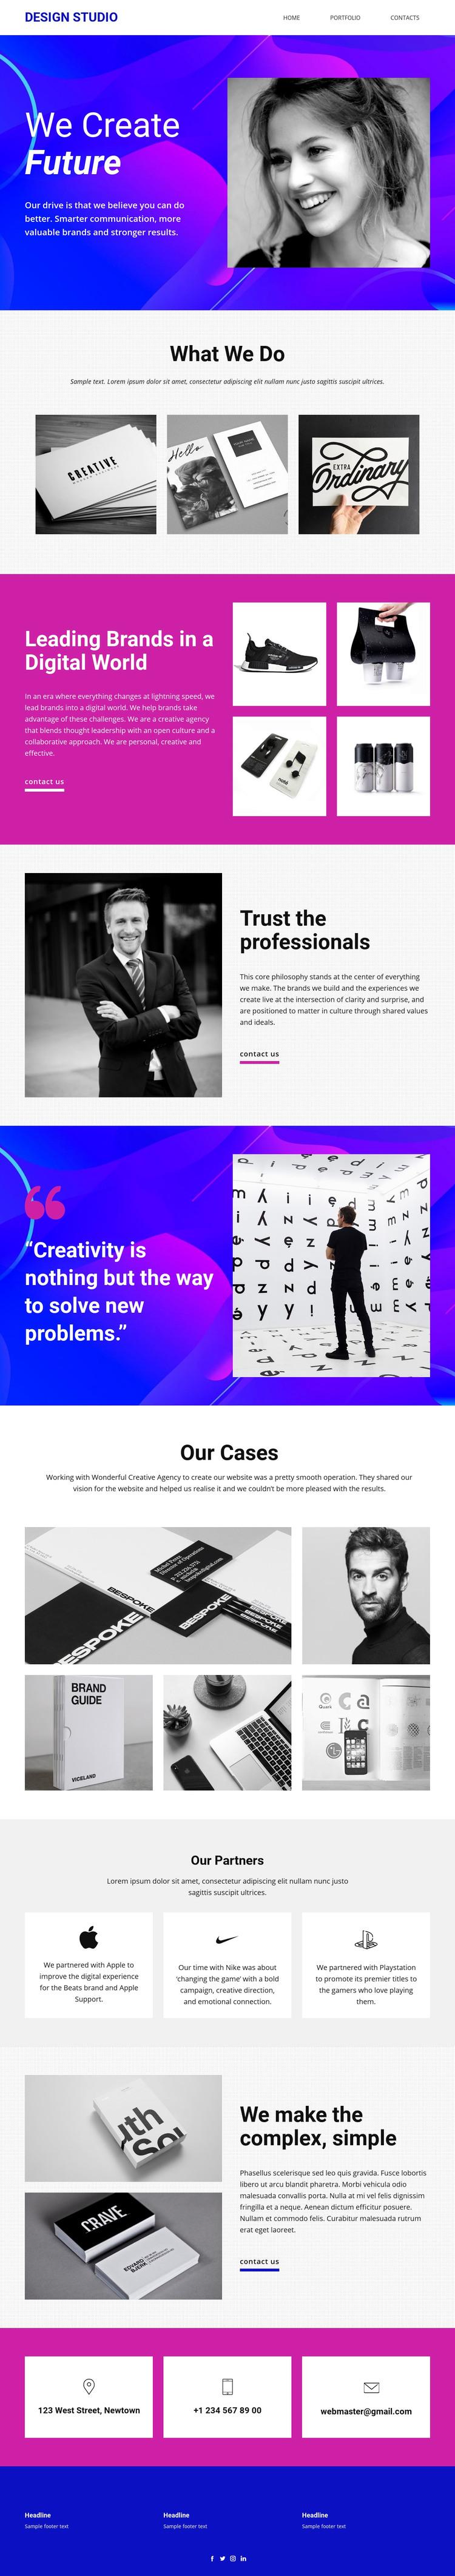 We develop the brand's core WordPress Website